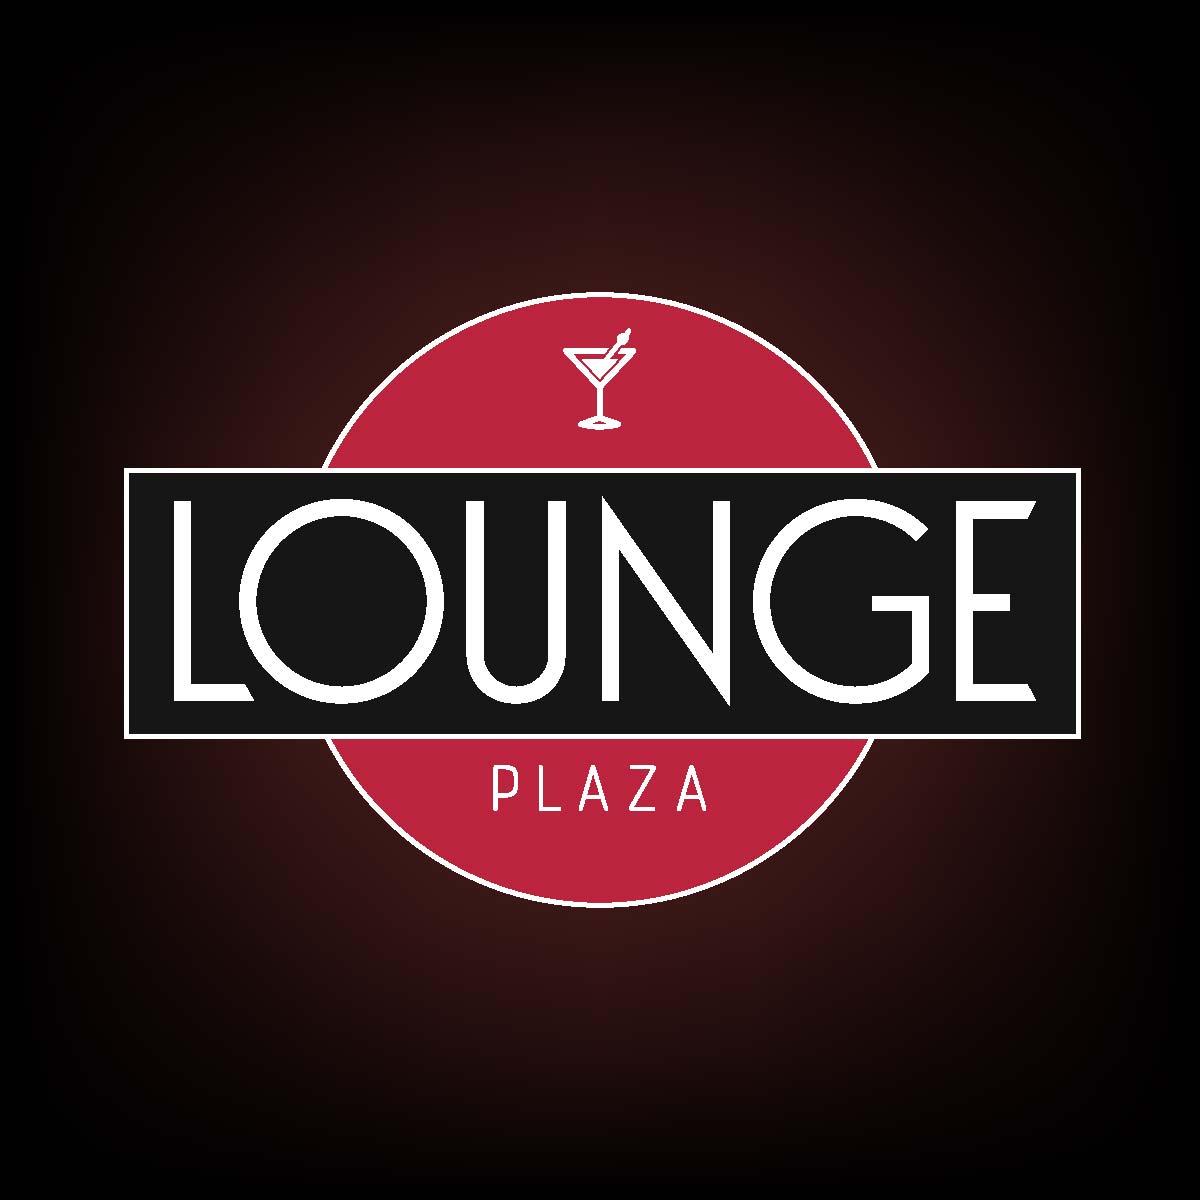 Lounge Plaza